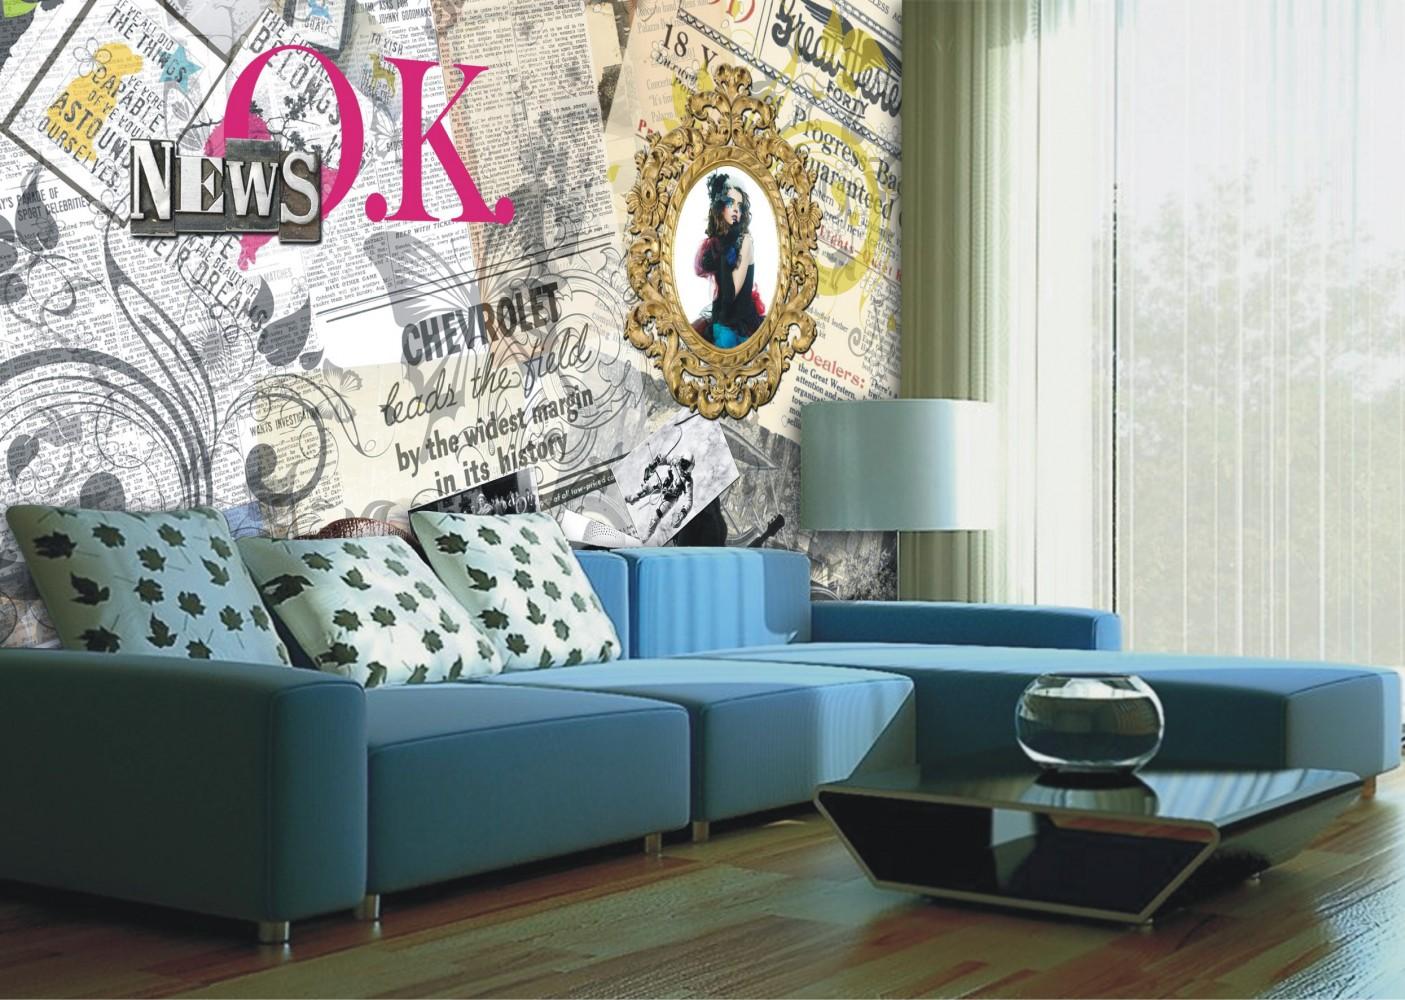 fototapete tapete vintage design zeitungsauschnitte foto 360 cm x 270 cm. Black Bedroom Furniture Sets. Home Design Ideas